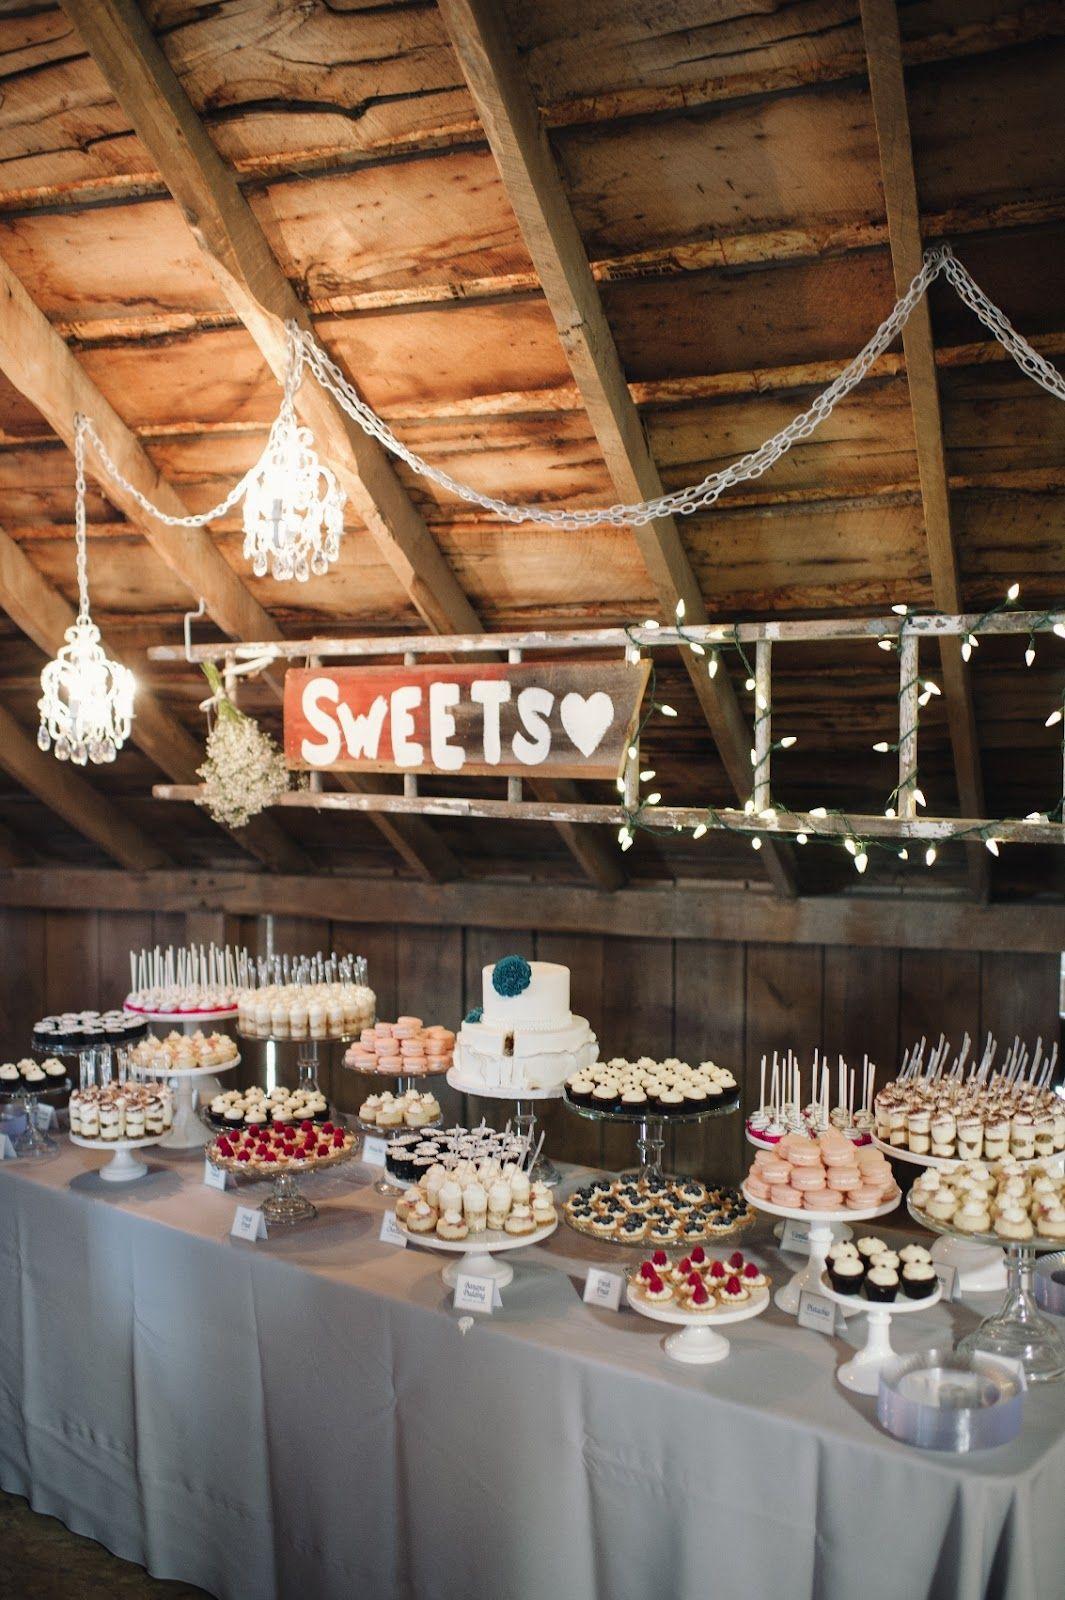 Barn Wedding Mini Dessert Table With Sweets Written On Barn Wood